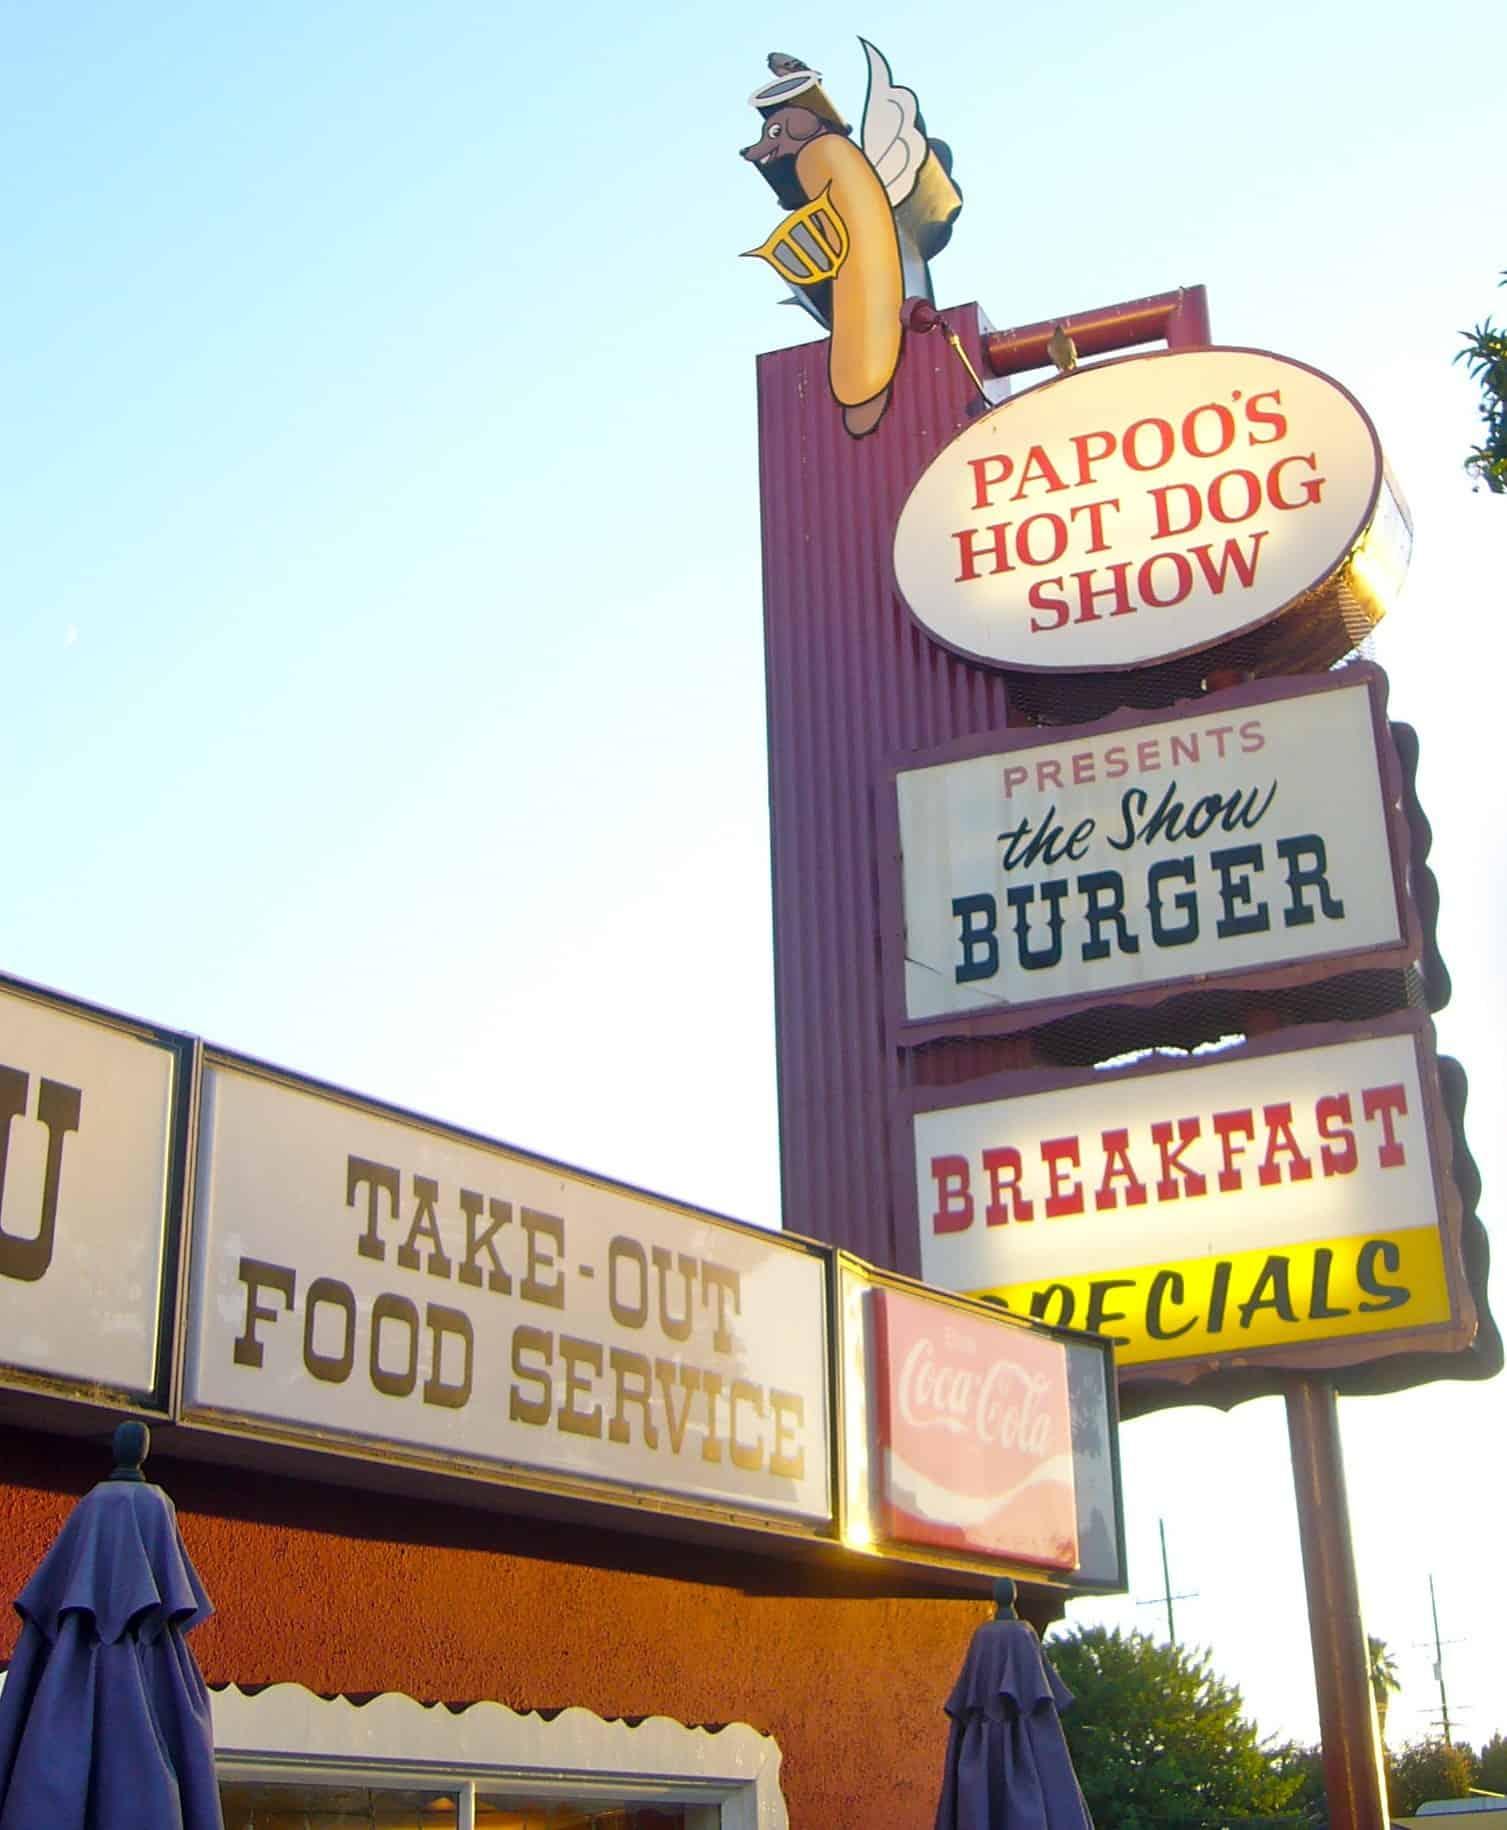 Chicago Hot Dogs Burbank California